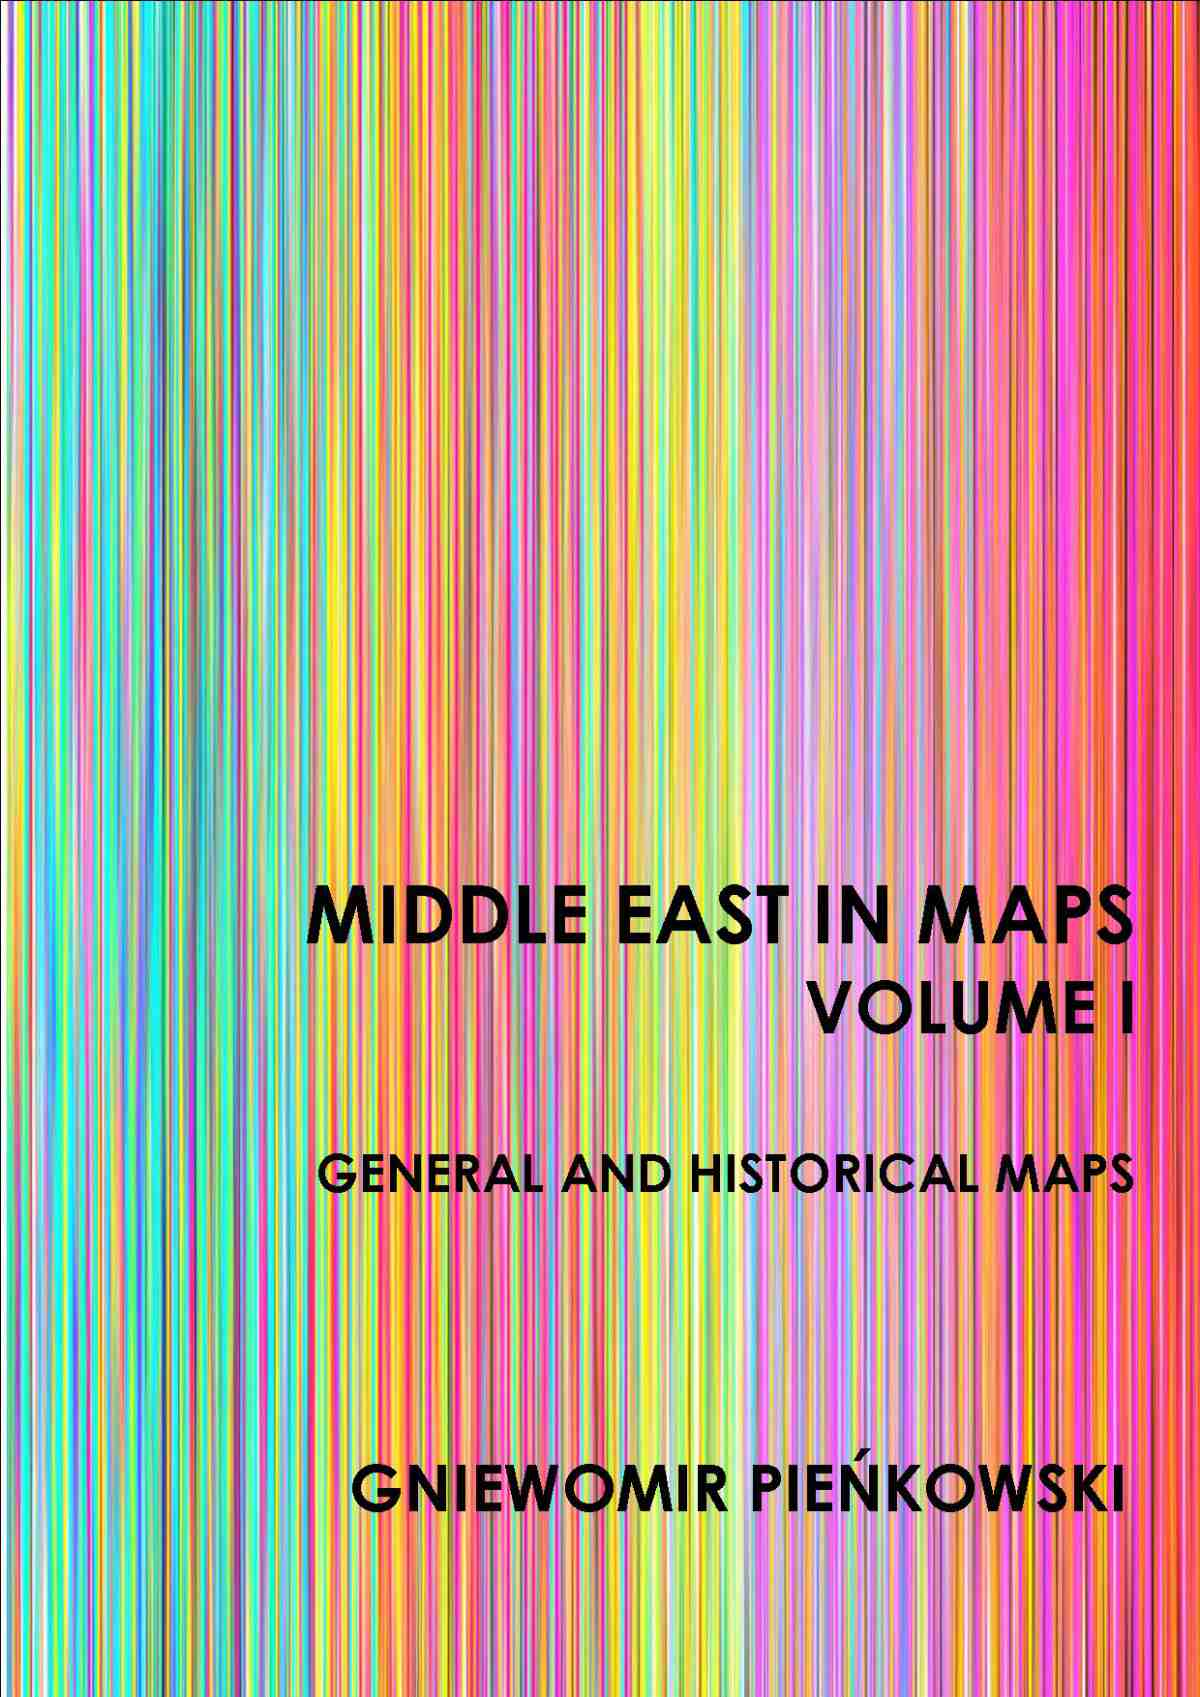 Middle East in Maps. Volume I: General and historical maps - Ebook (Książka PDF) do pobrania w formacie PDF